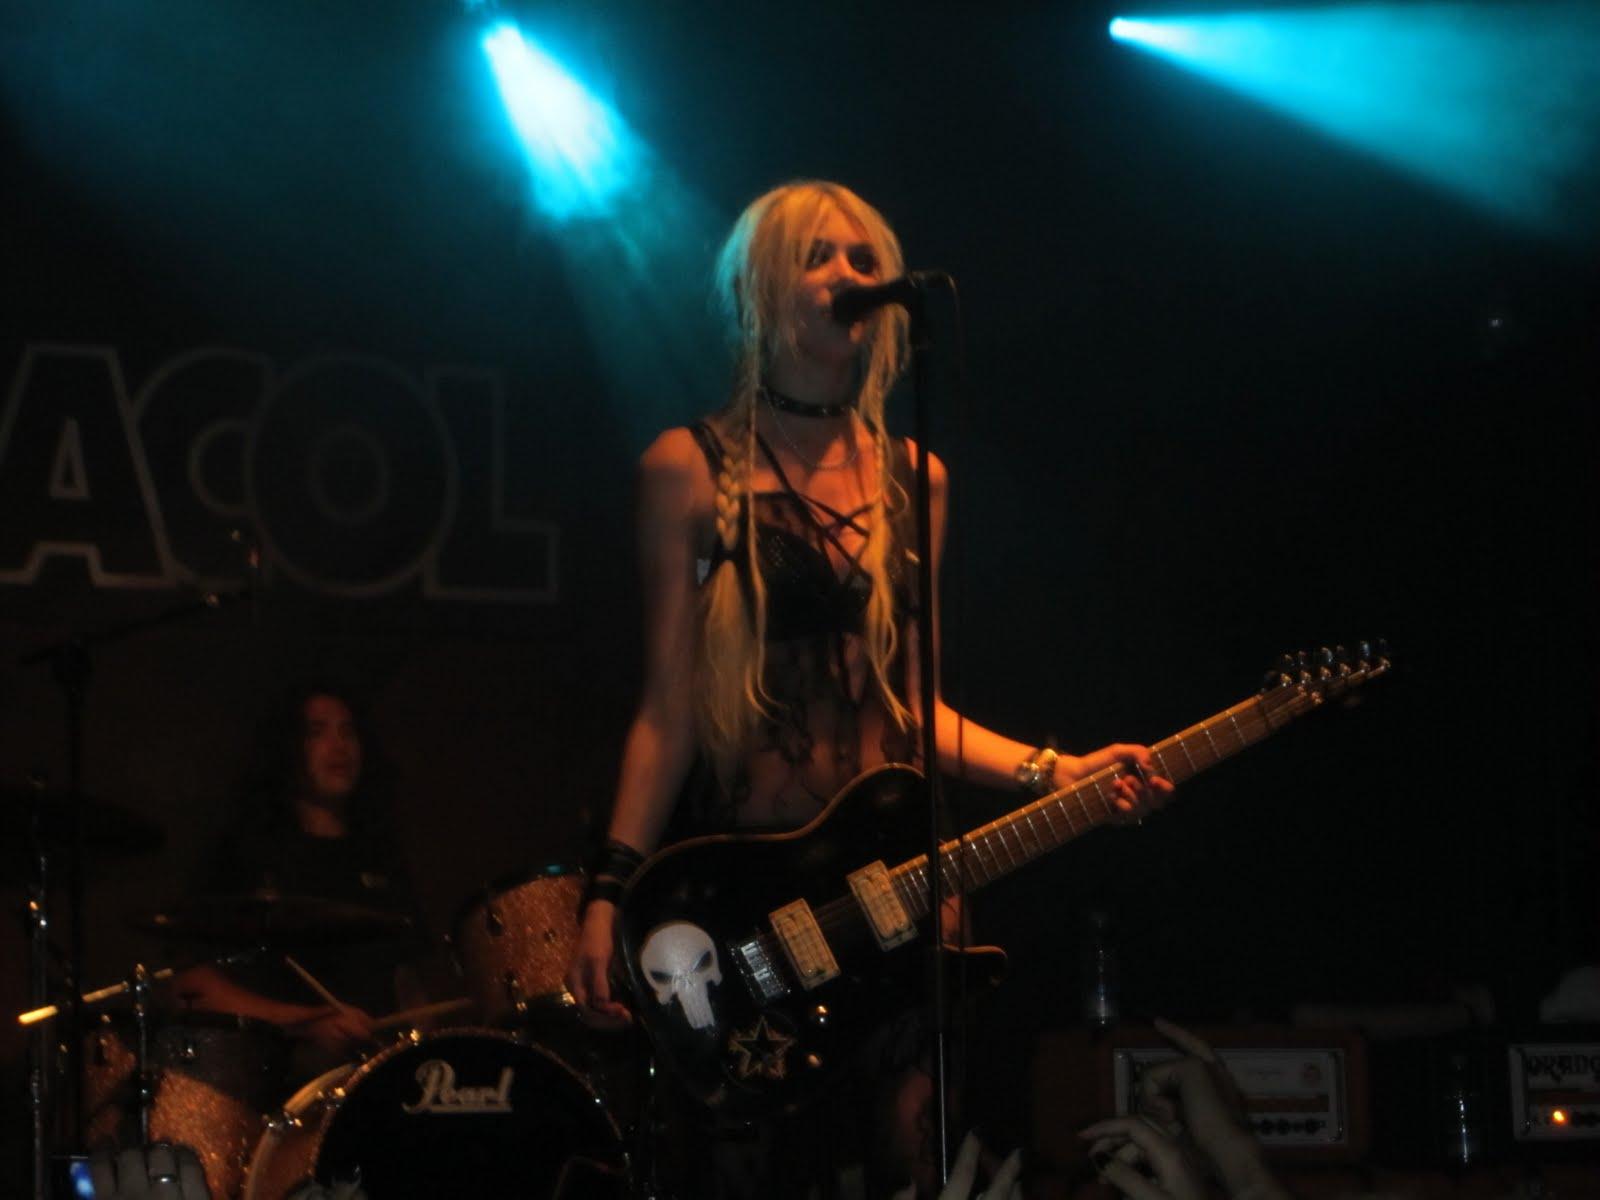 http://2.bp.blogspot.com/-hEkdG7QPF1c/Thg70HwFyuI/AAAAAAAAAhI/aV0NlydT_Lw/s1600/Taylor+Momsen+Sala+Caracol.JPG